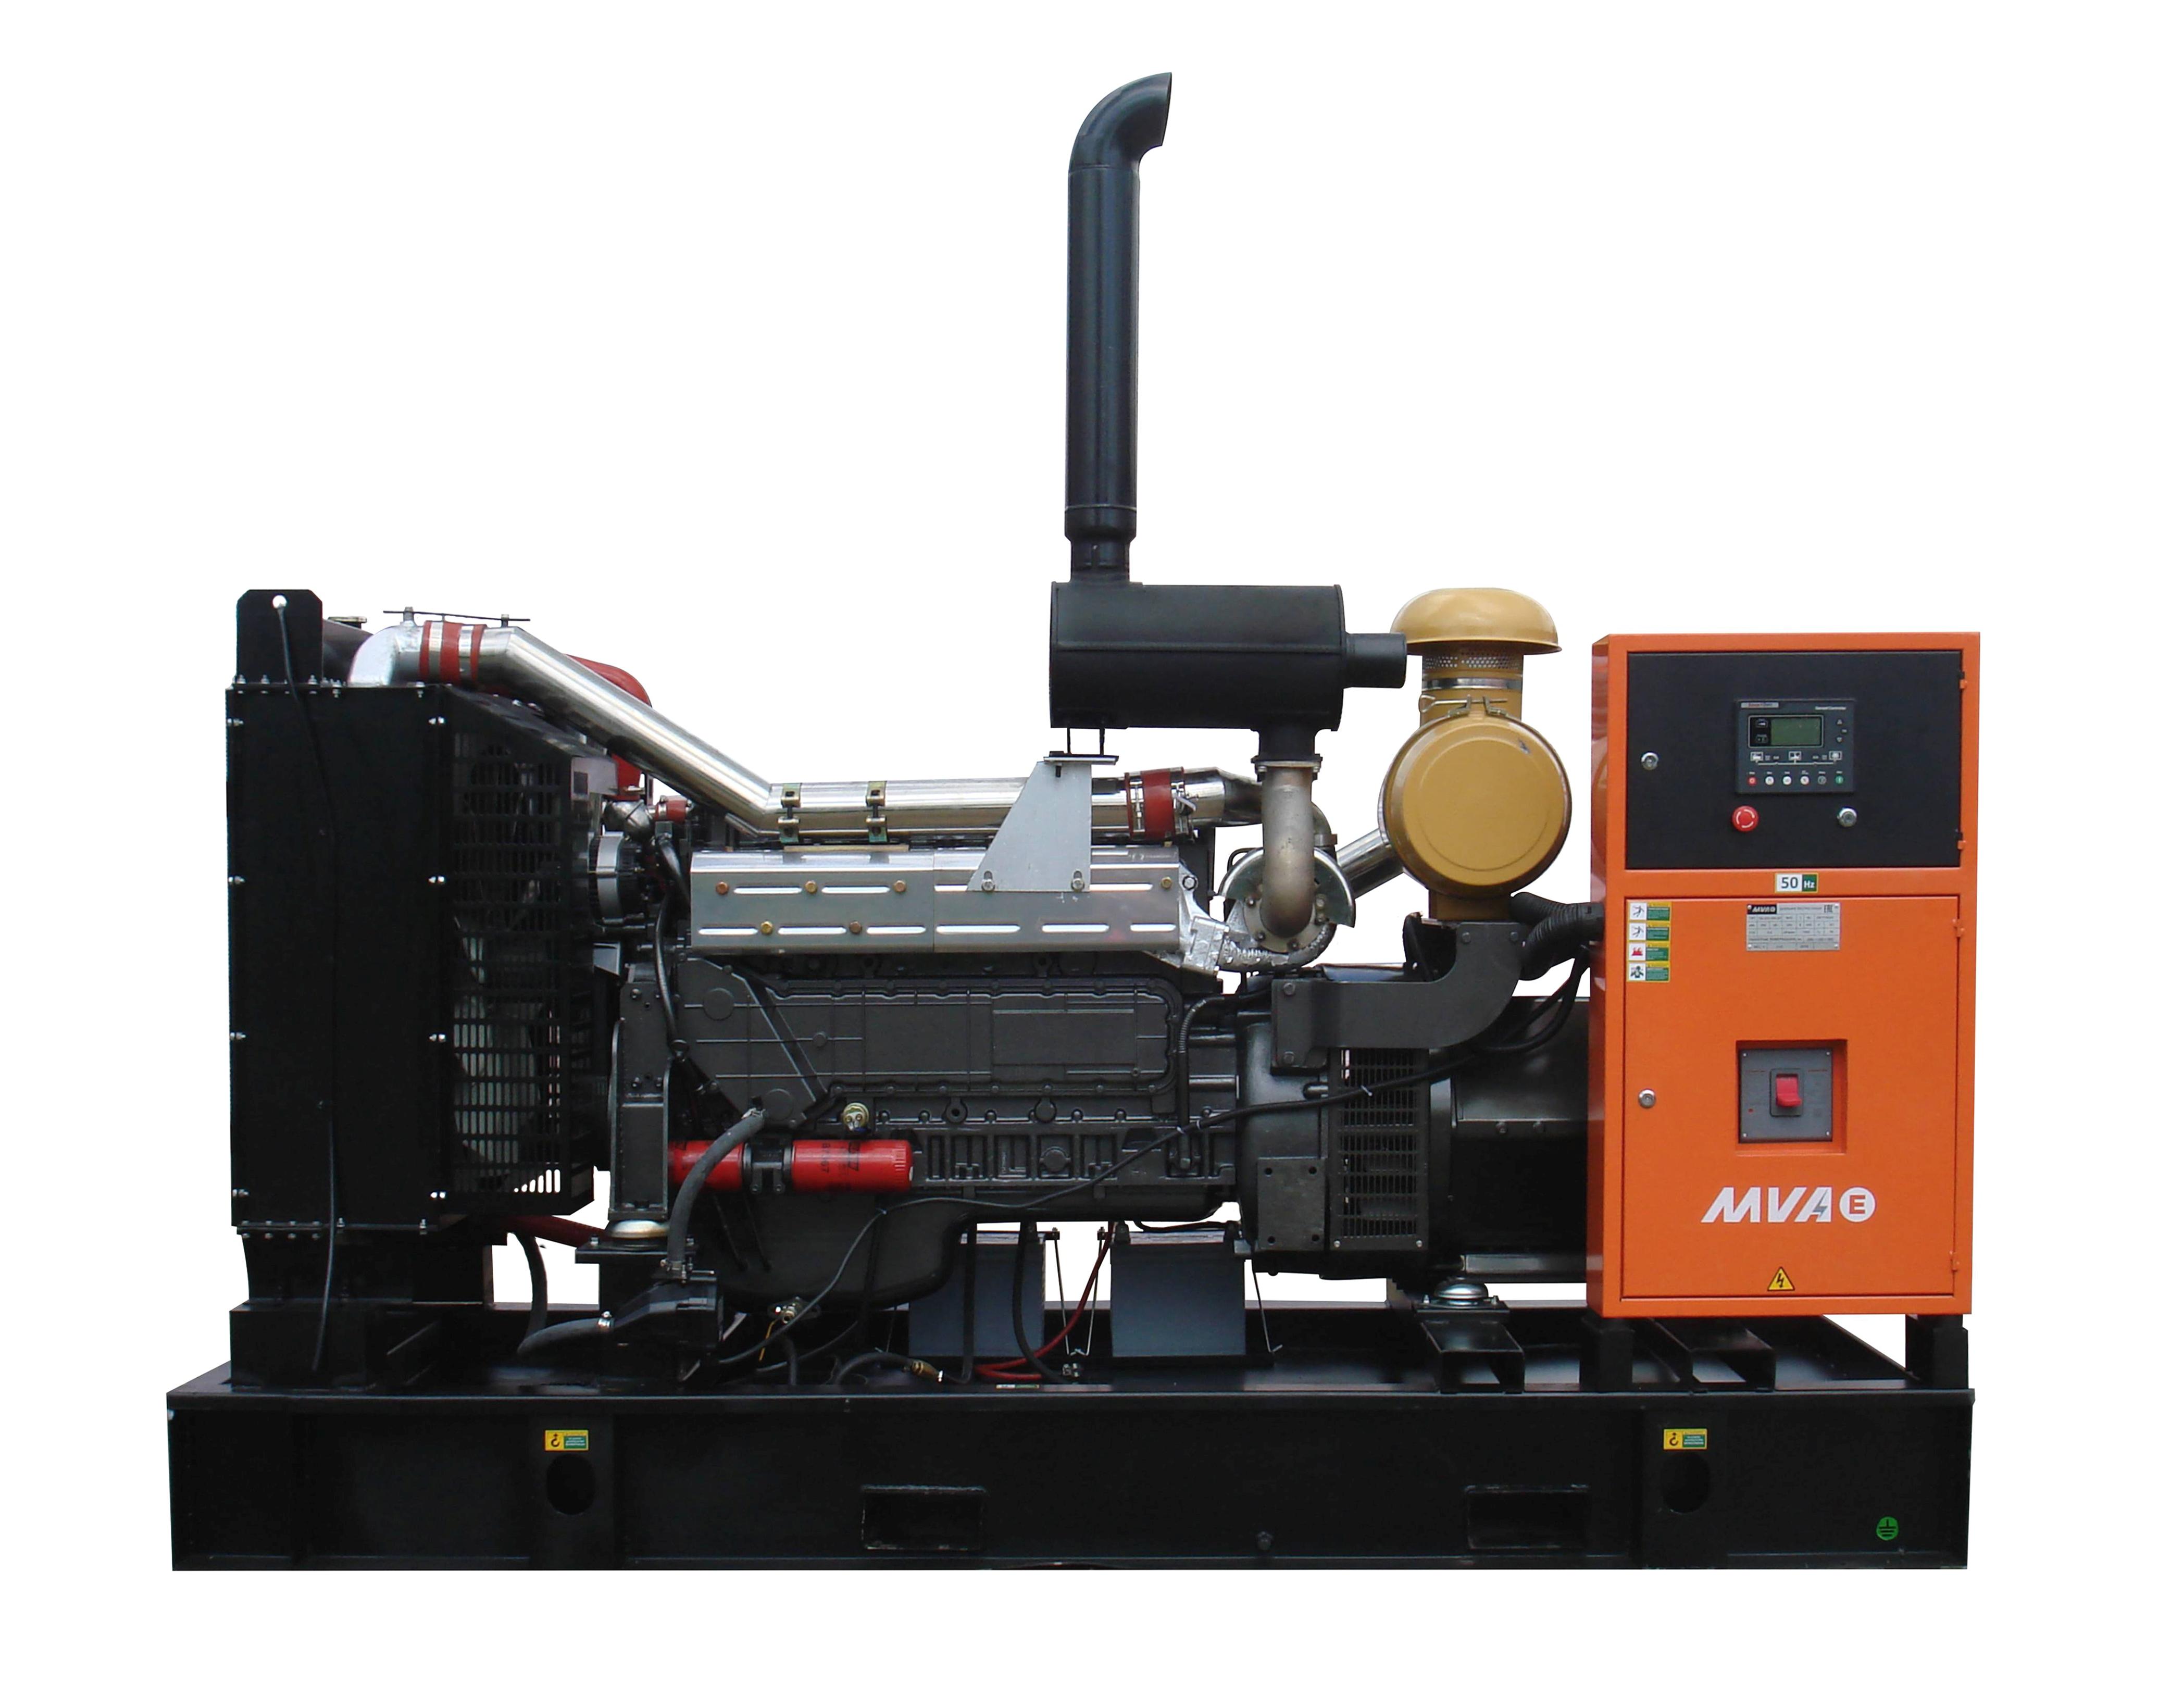 Дизель-генератор Mvae АД-240-400-АР